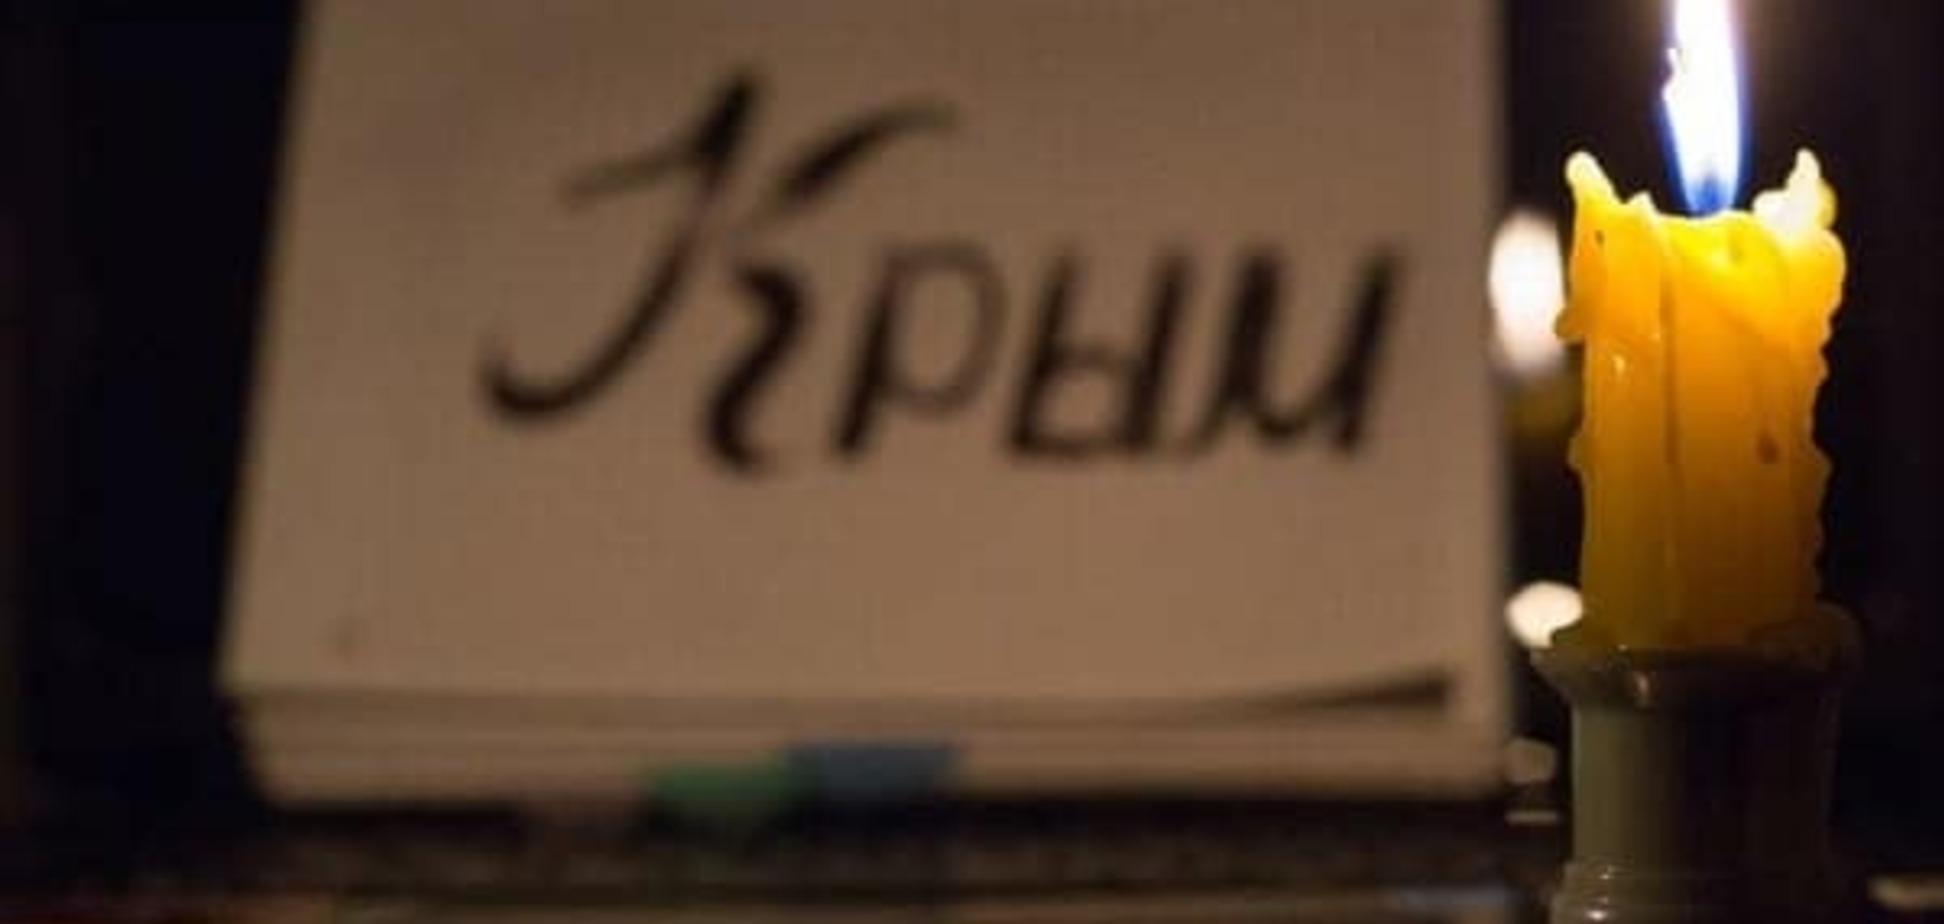 Зменшіть апетити: жителям Севастополя знову урізали подачу електрики